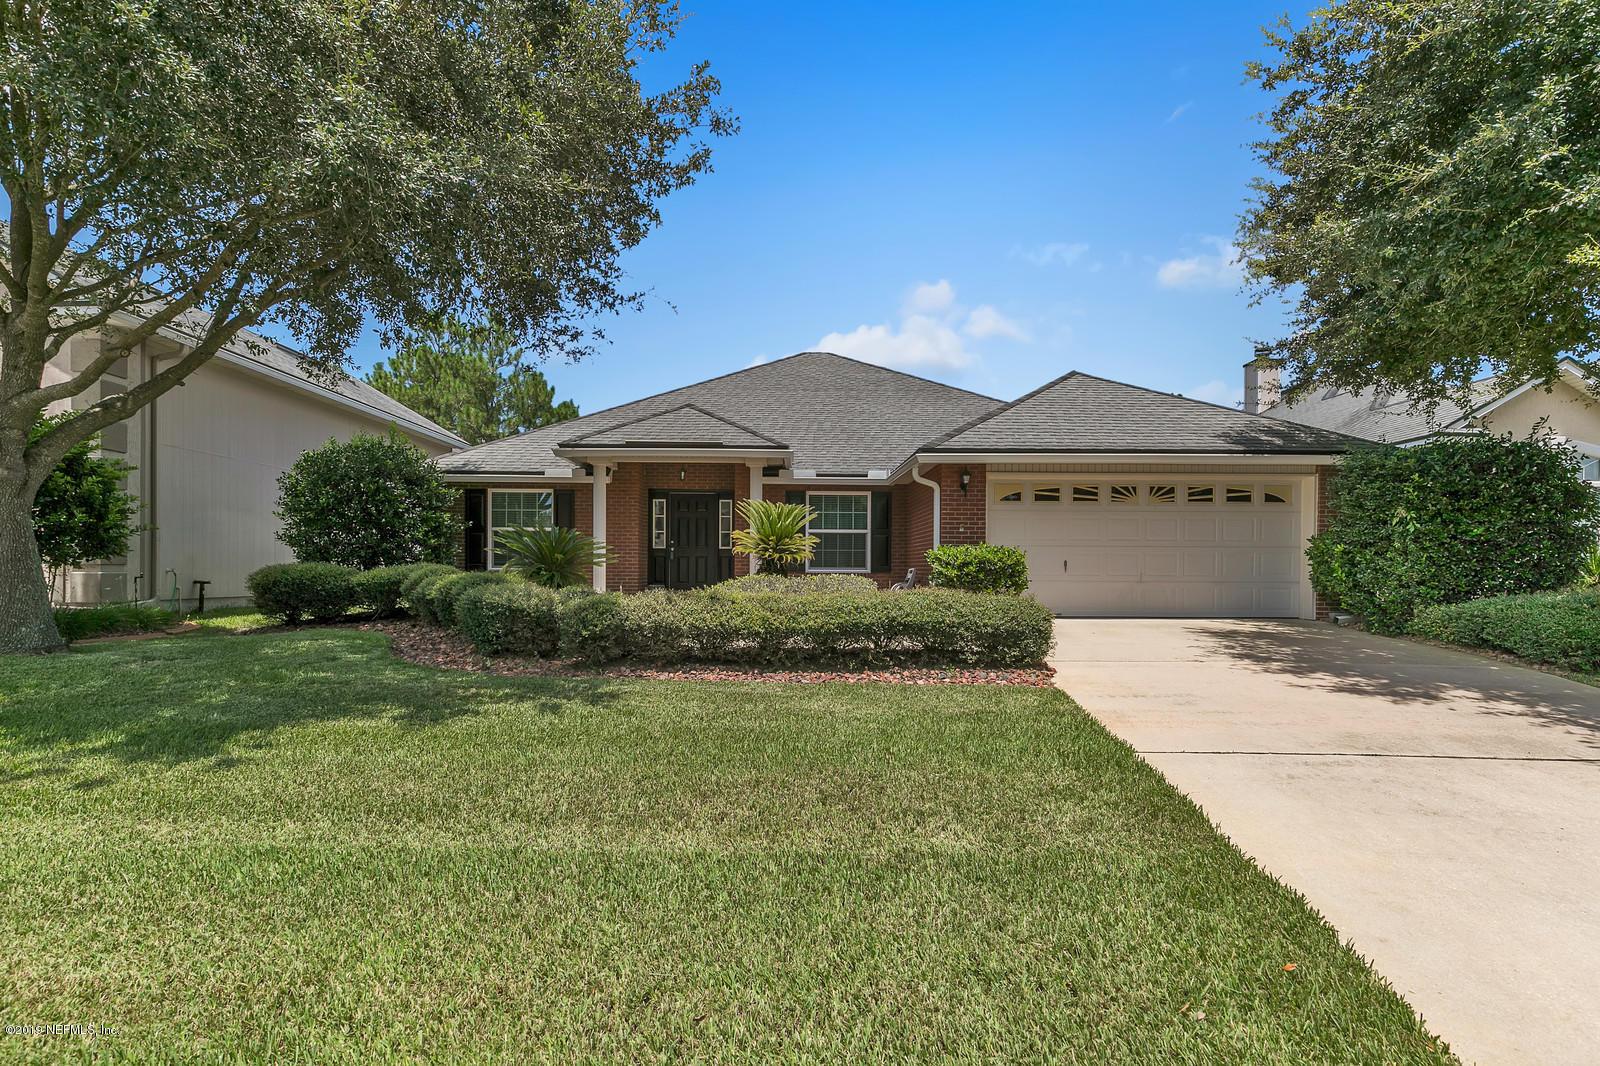 3102 WANDERING OAKS, ORANGE PARK, FLORIDA 32065, 3 Bedrooms Bedrooms, ,2 BathroomsBathrooms,Residential - single family,For sale,WANDERING OAKS,1008736